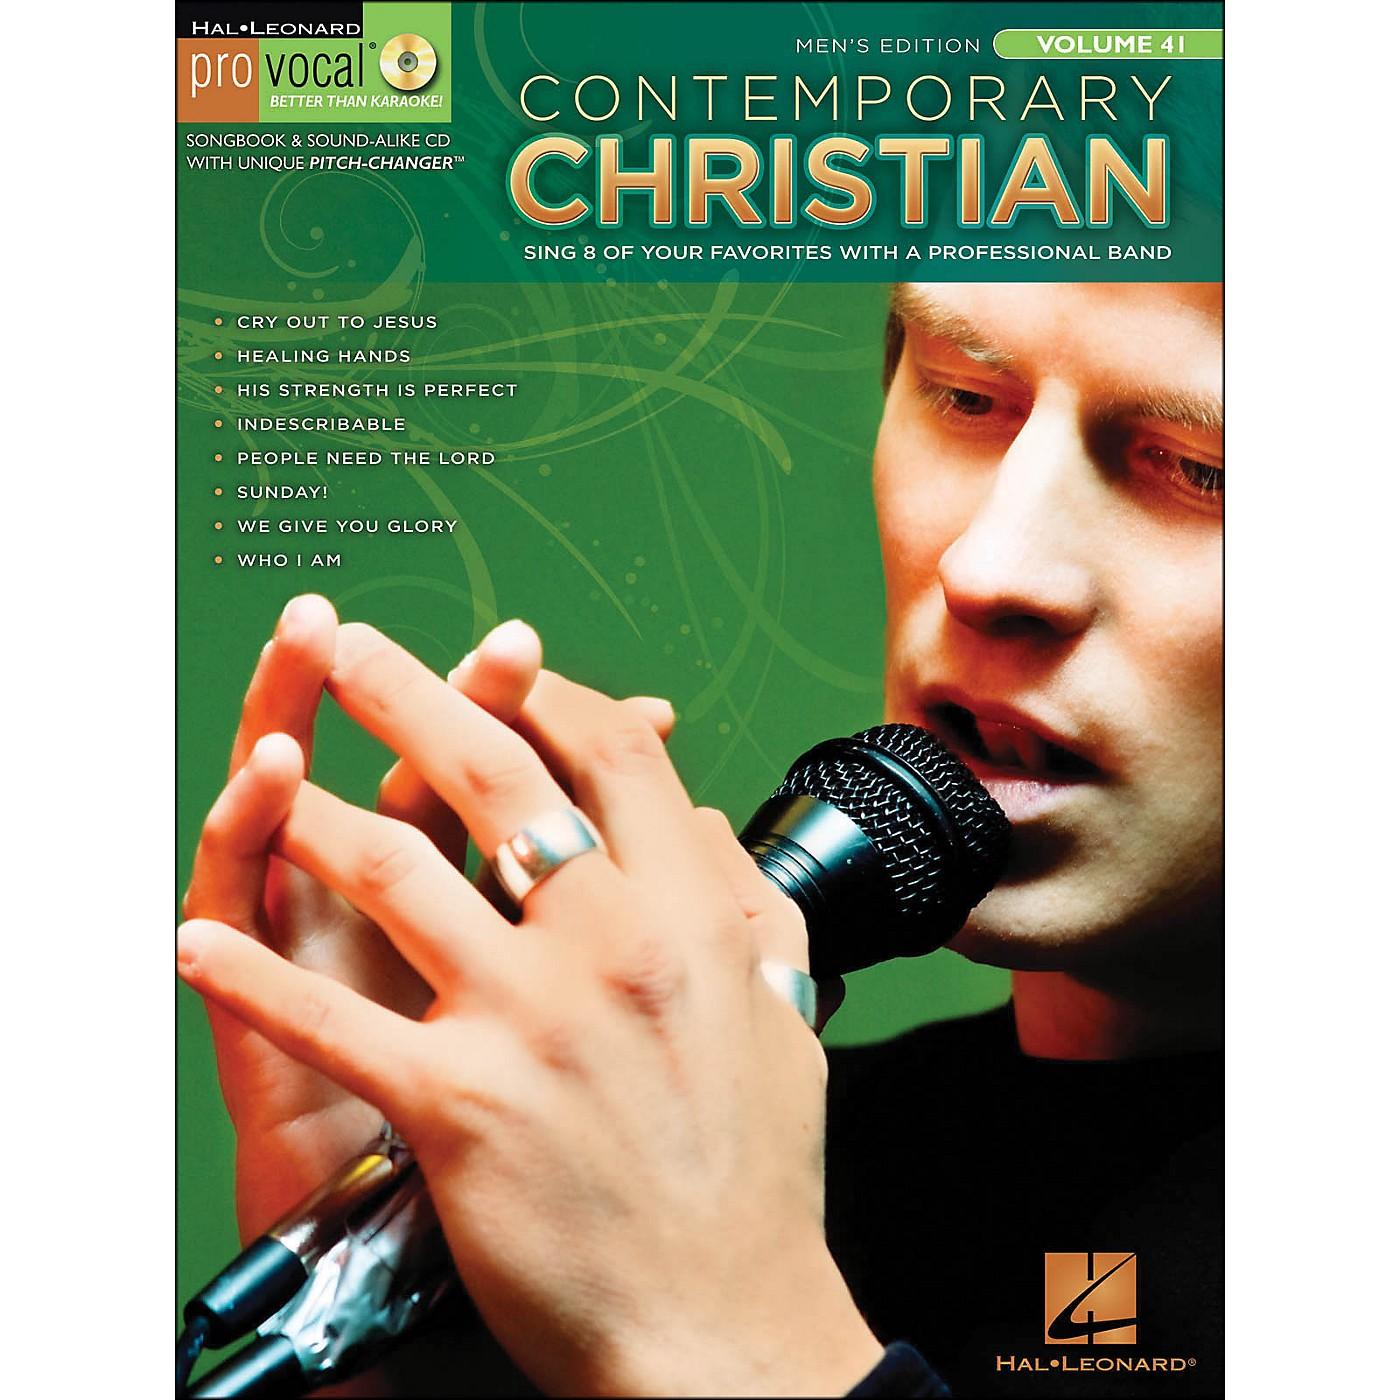 Hal Leonard Contemporary Christian Pro Vocal Songbook & CD - Men's Edition Volume 41 thumbnail